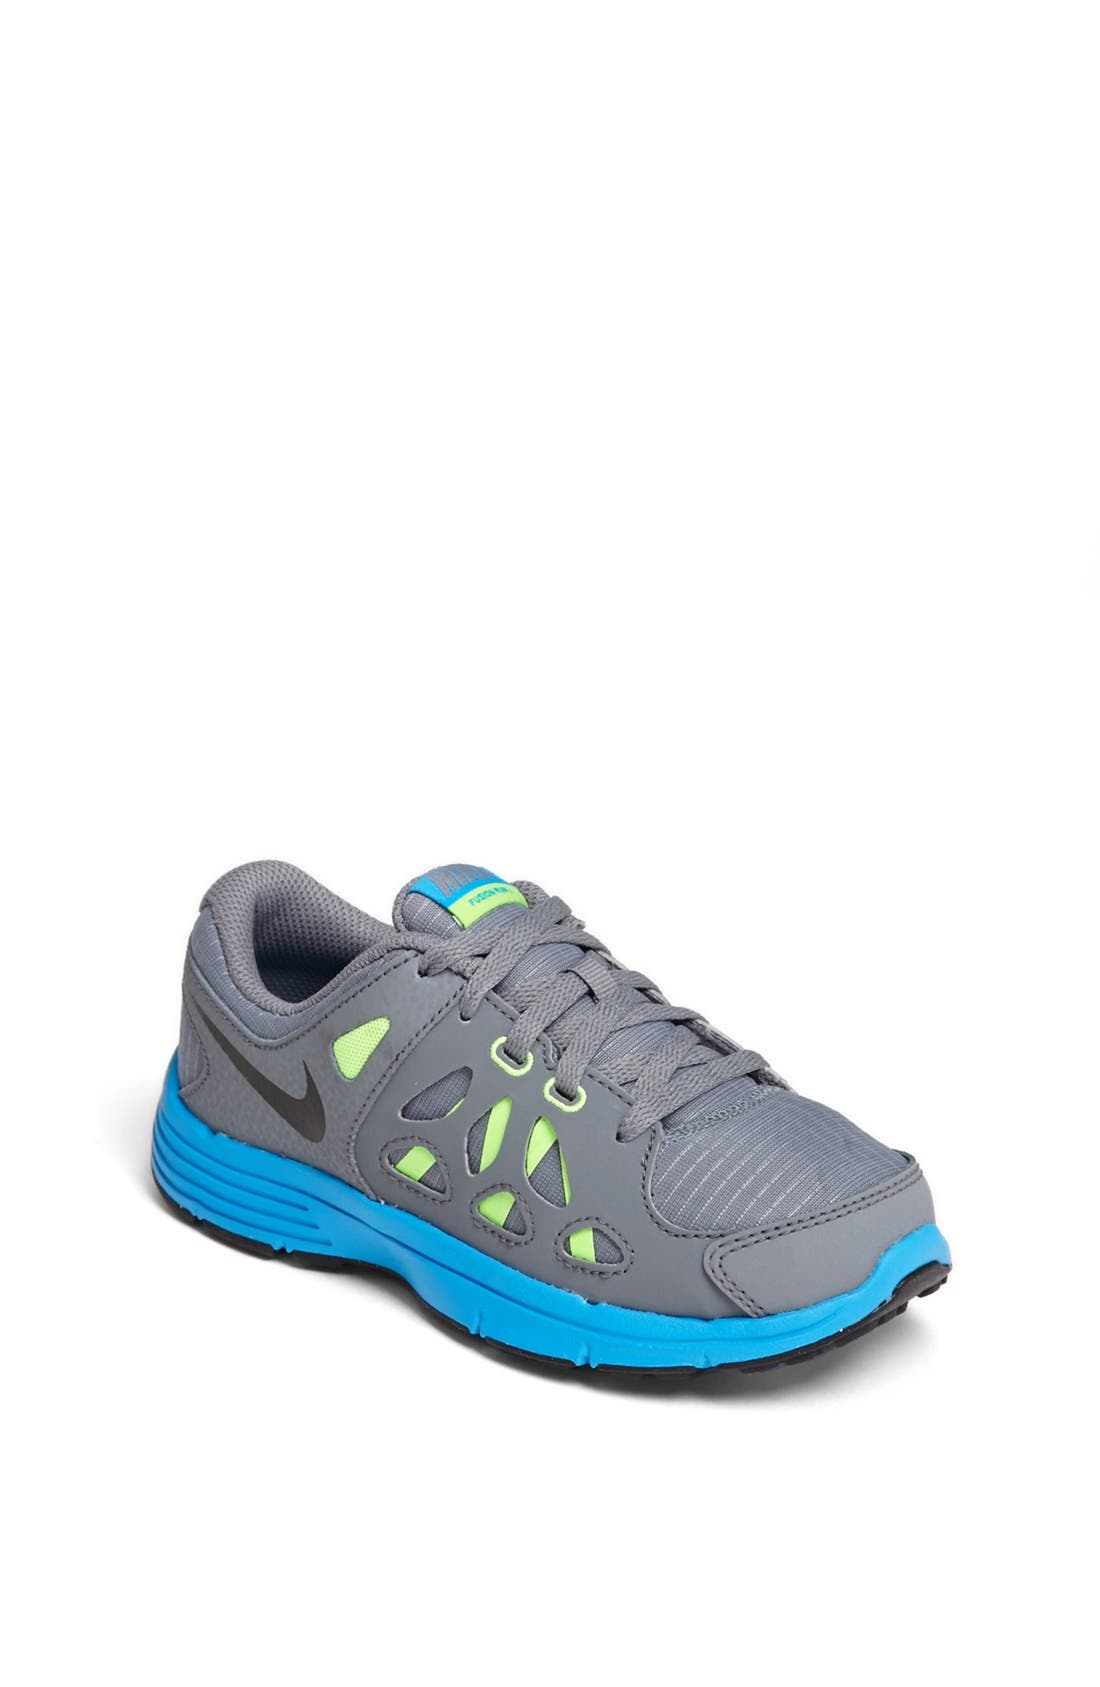 Alternate Image 1 Selected - Nike 'Dual Fusion' Sneaker (Little Kid)